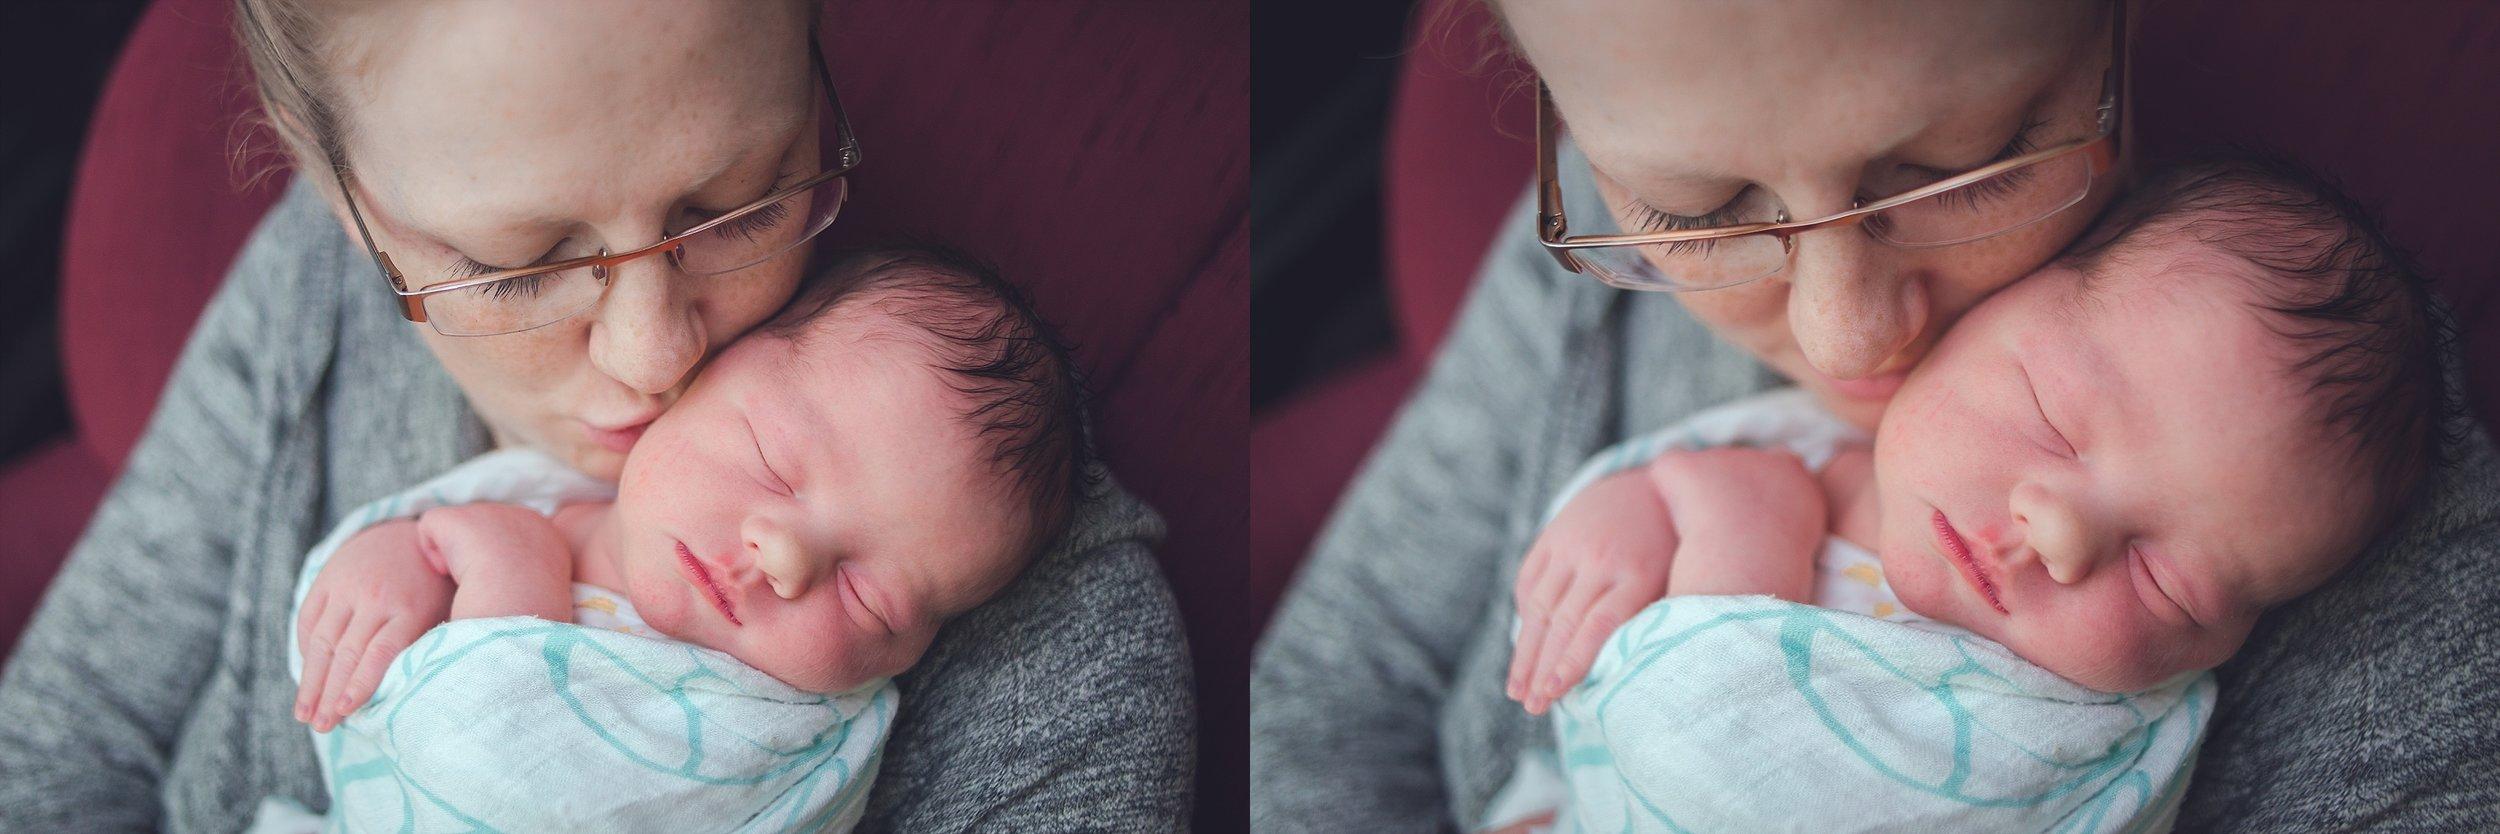 BrittneyHogue-NewbornPhotographer-FamilyPhotographer-PeoriaIL-PekinIL-MortonIL (2).jpg